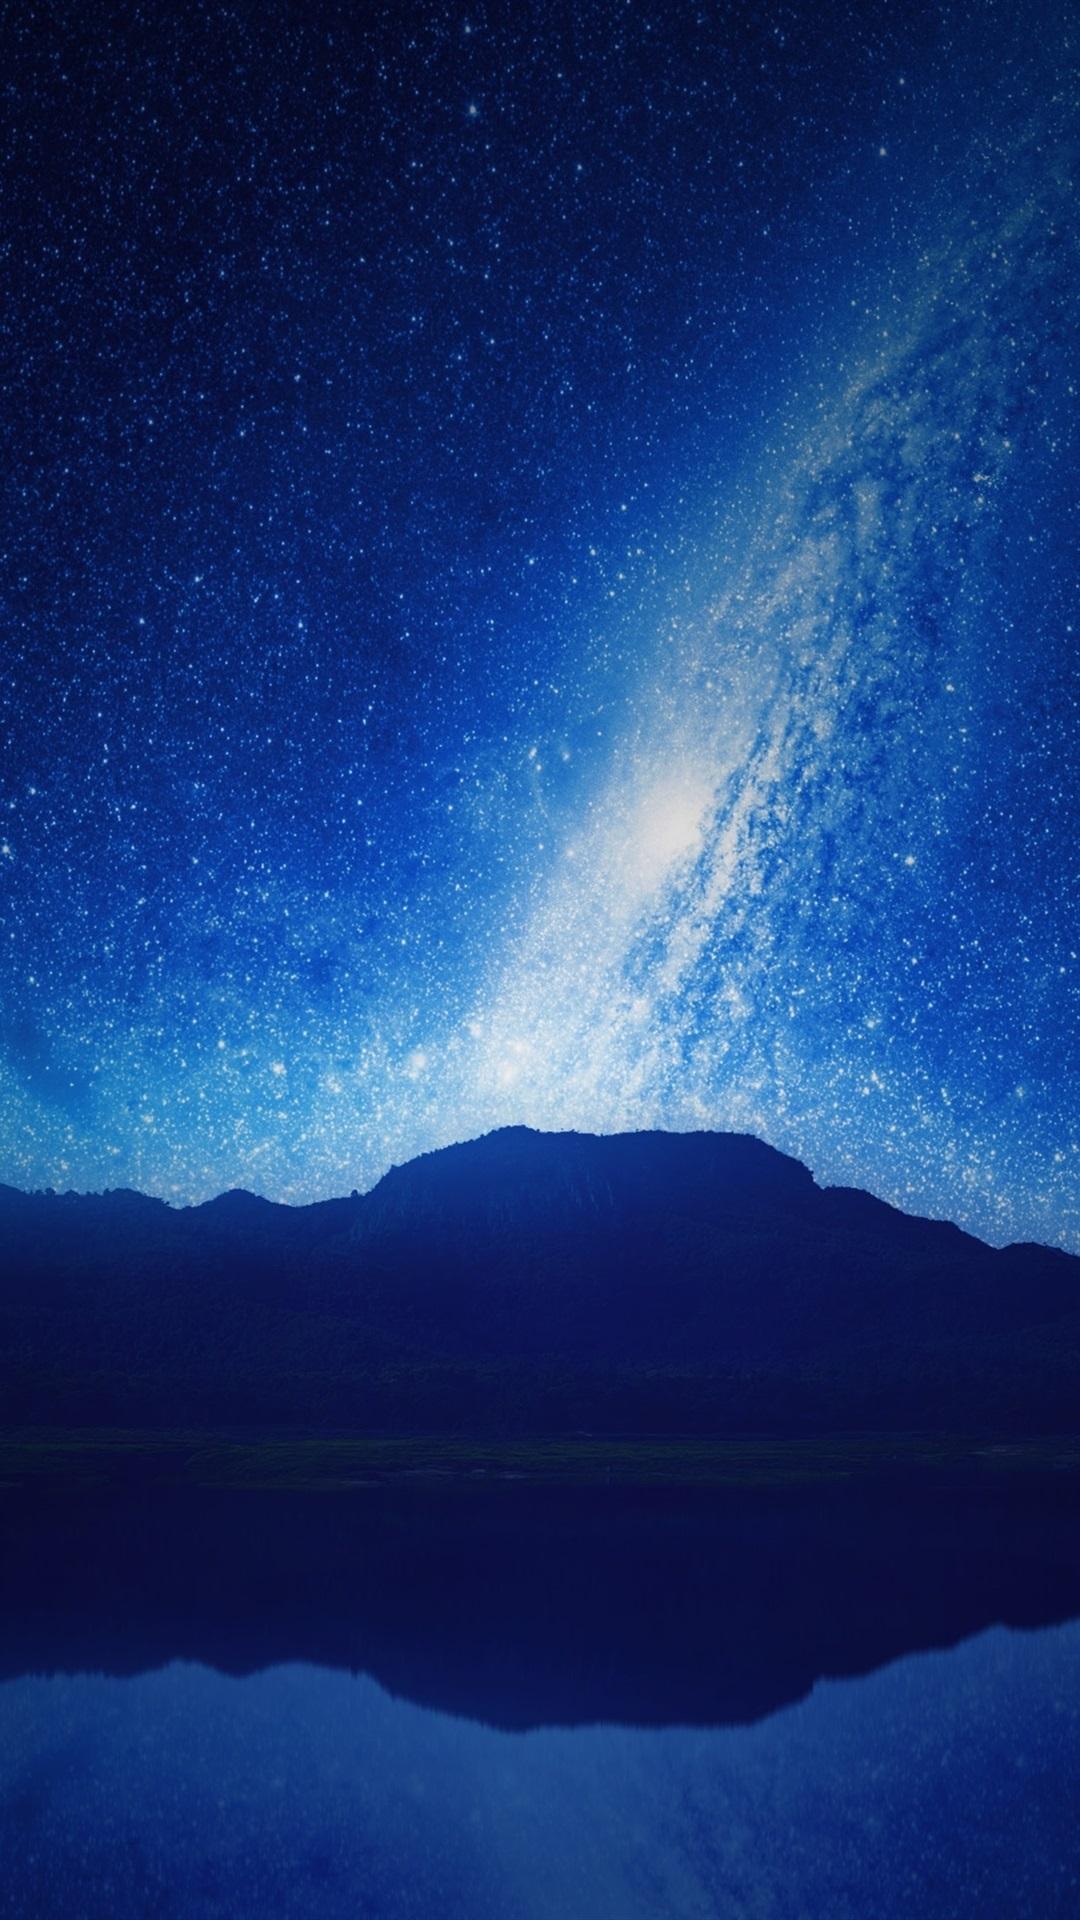 Wallpaper night mountains lake reflection starry sky - Starry sky 4k ...